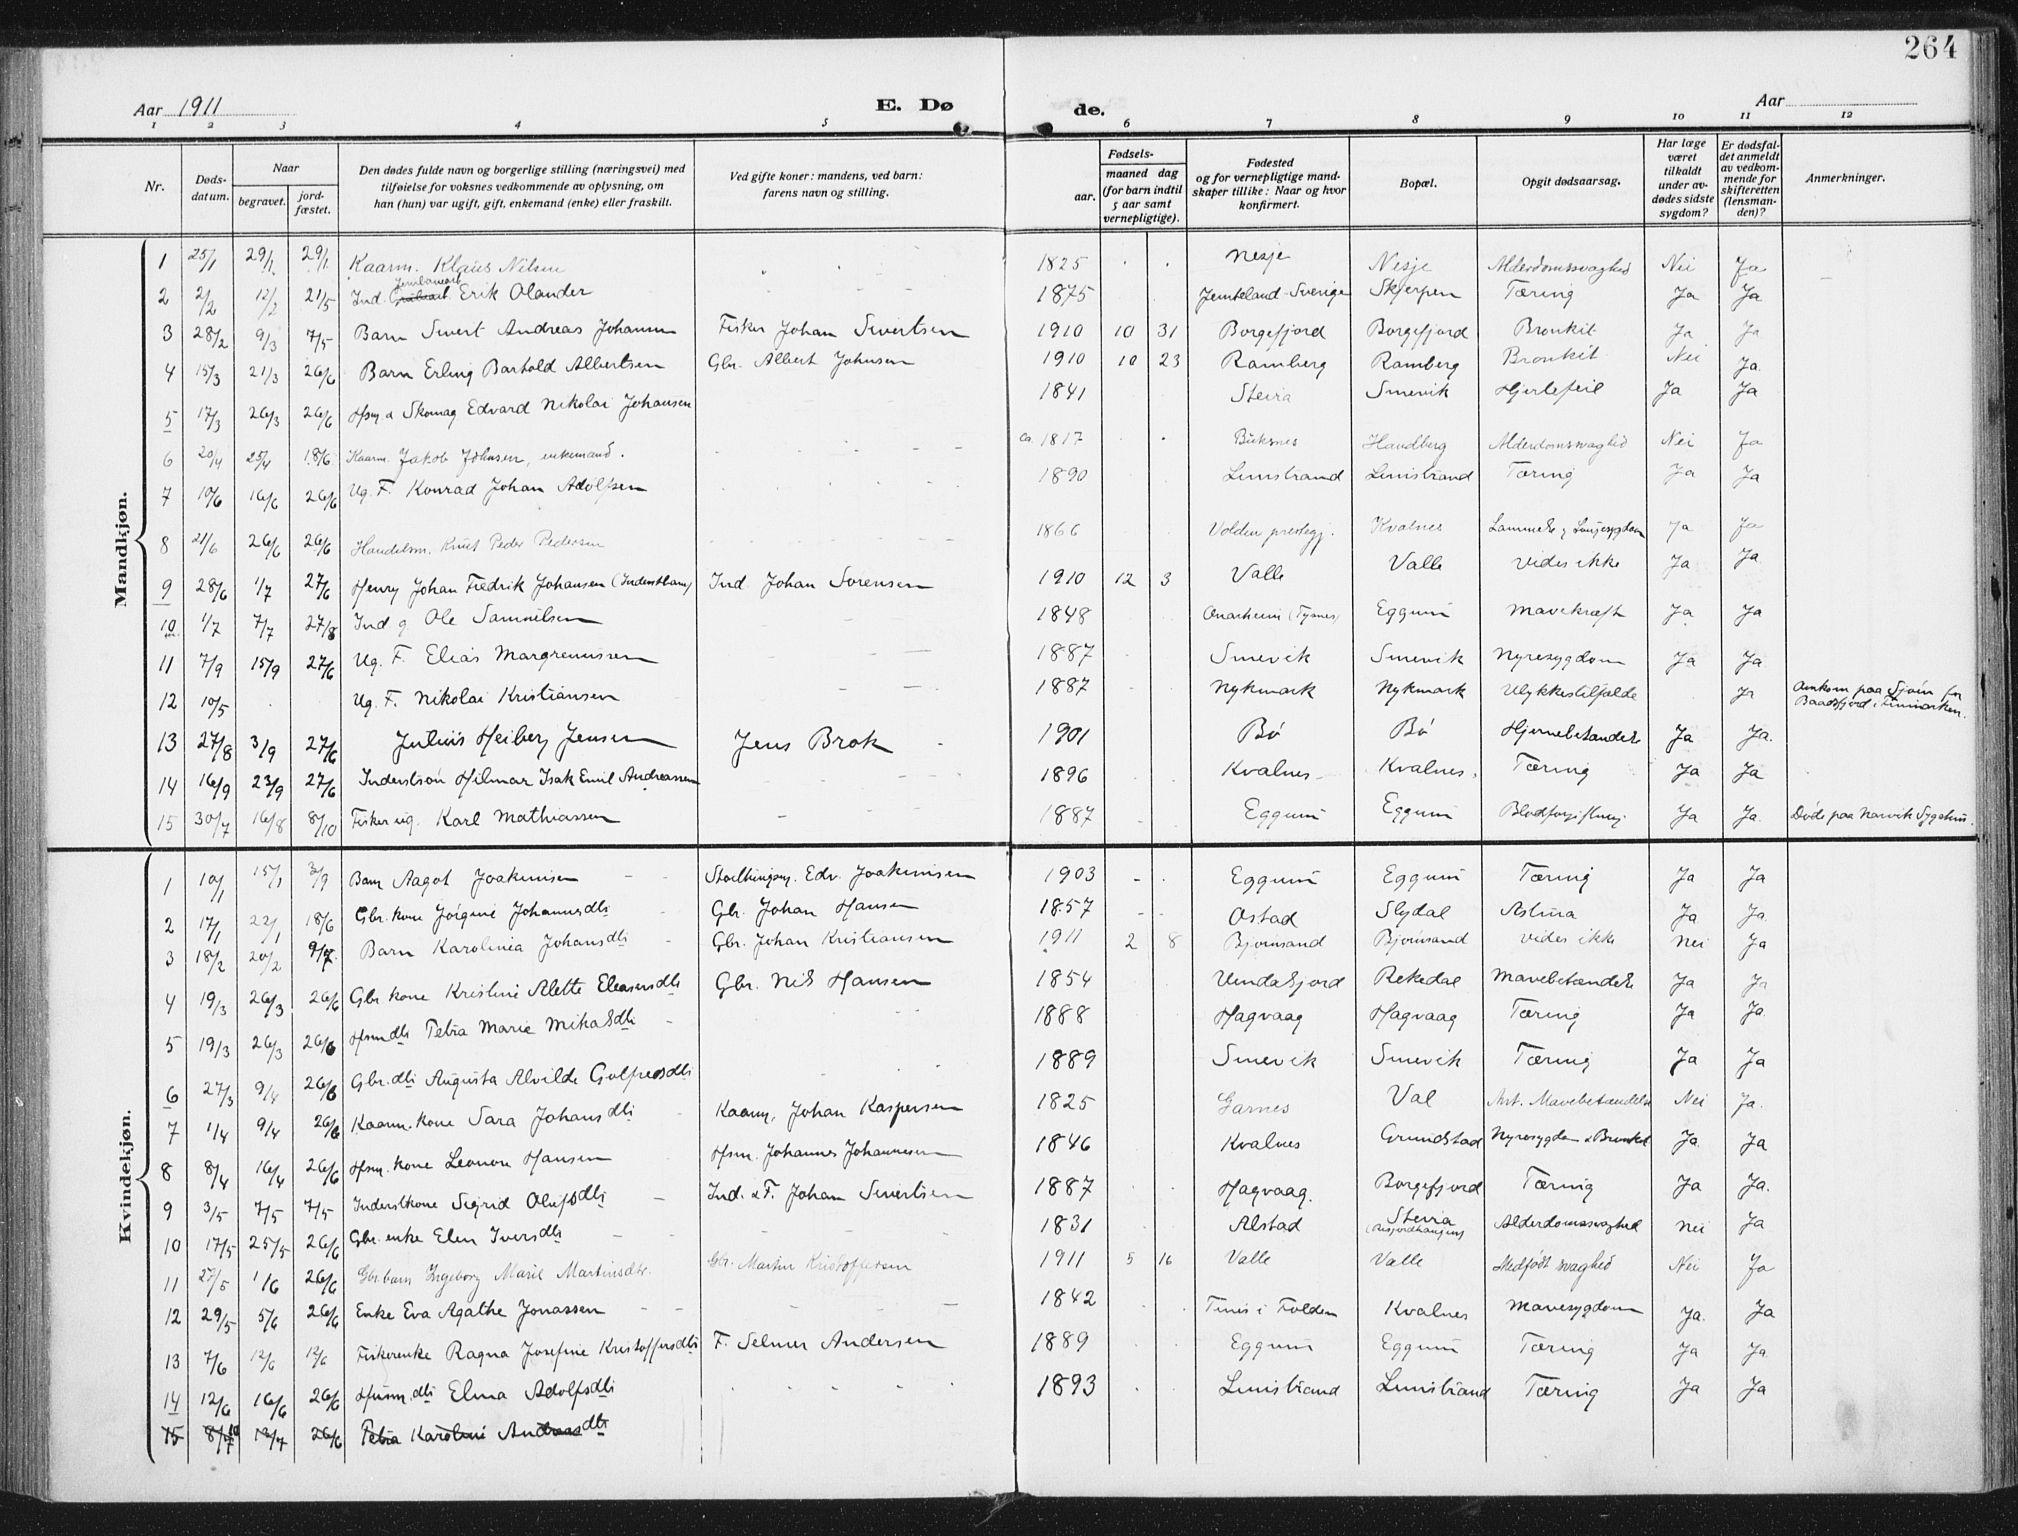 SAT, Ministerialprotokoller, klokkerbøker og fødselsregistre - Nordland, 880/L1135: Ministerialbok nr. 880A09, 1908-1919, s. 264